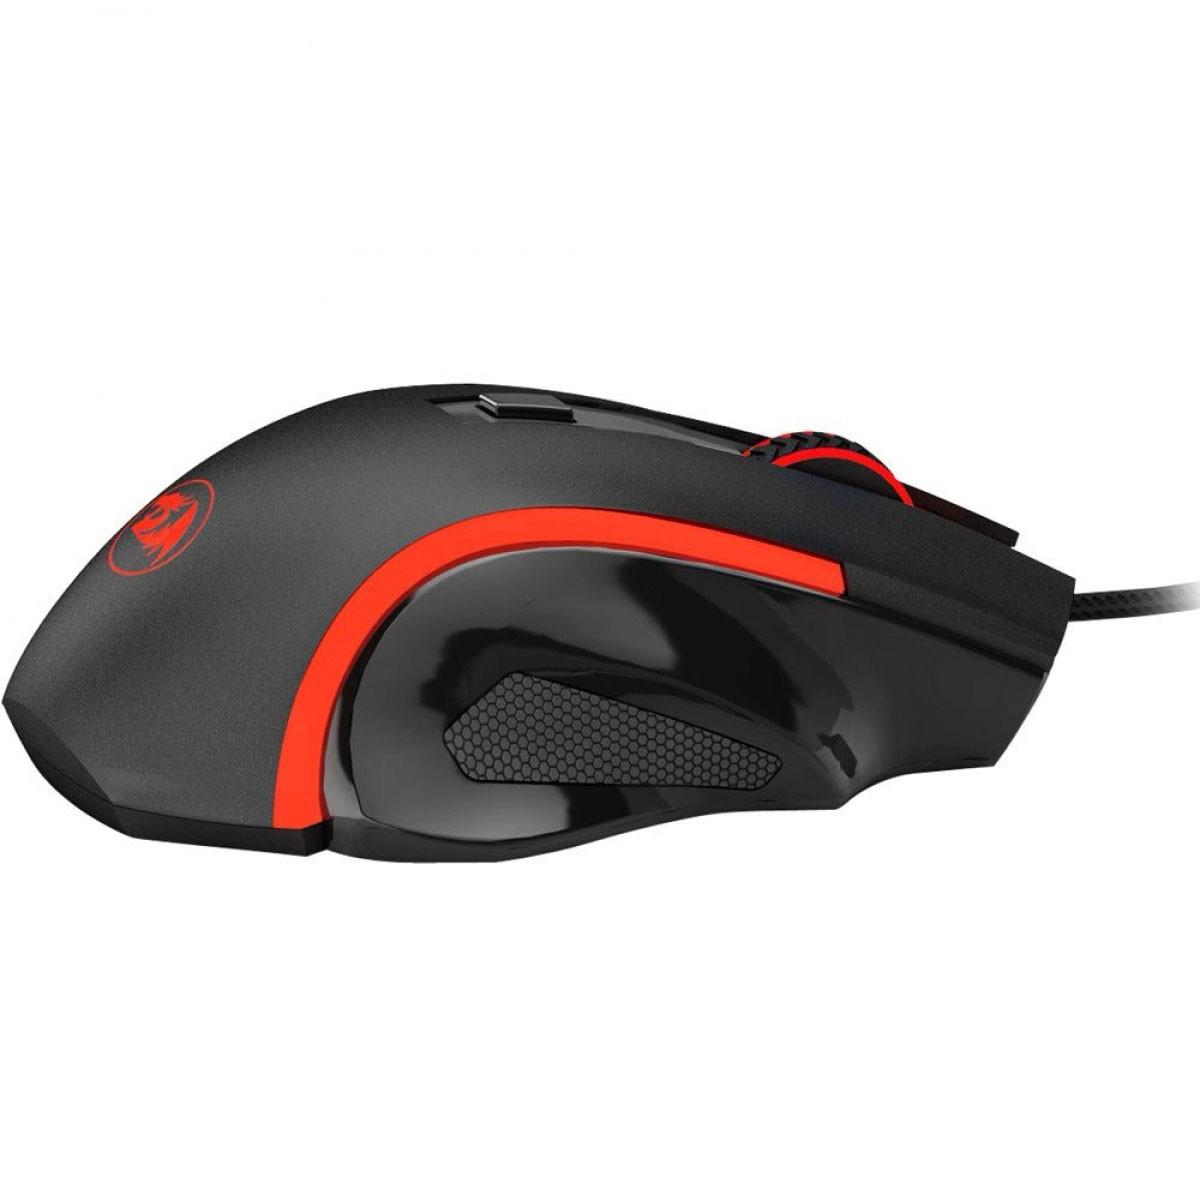 Mouse Gamer Nothosaur M606 Preto 3200 DPI - Redragon